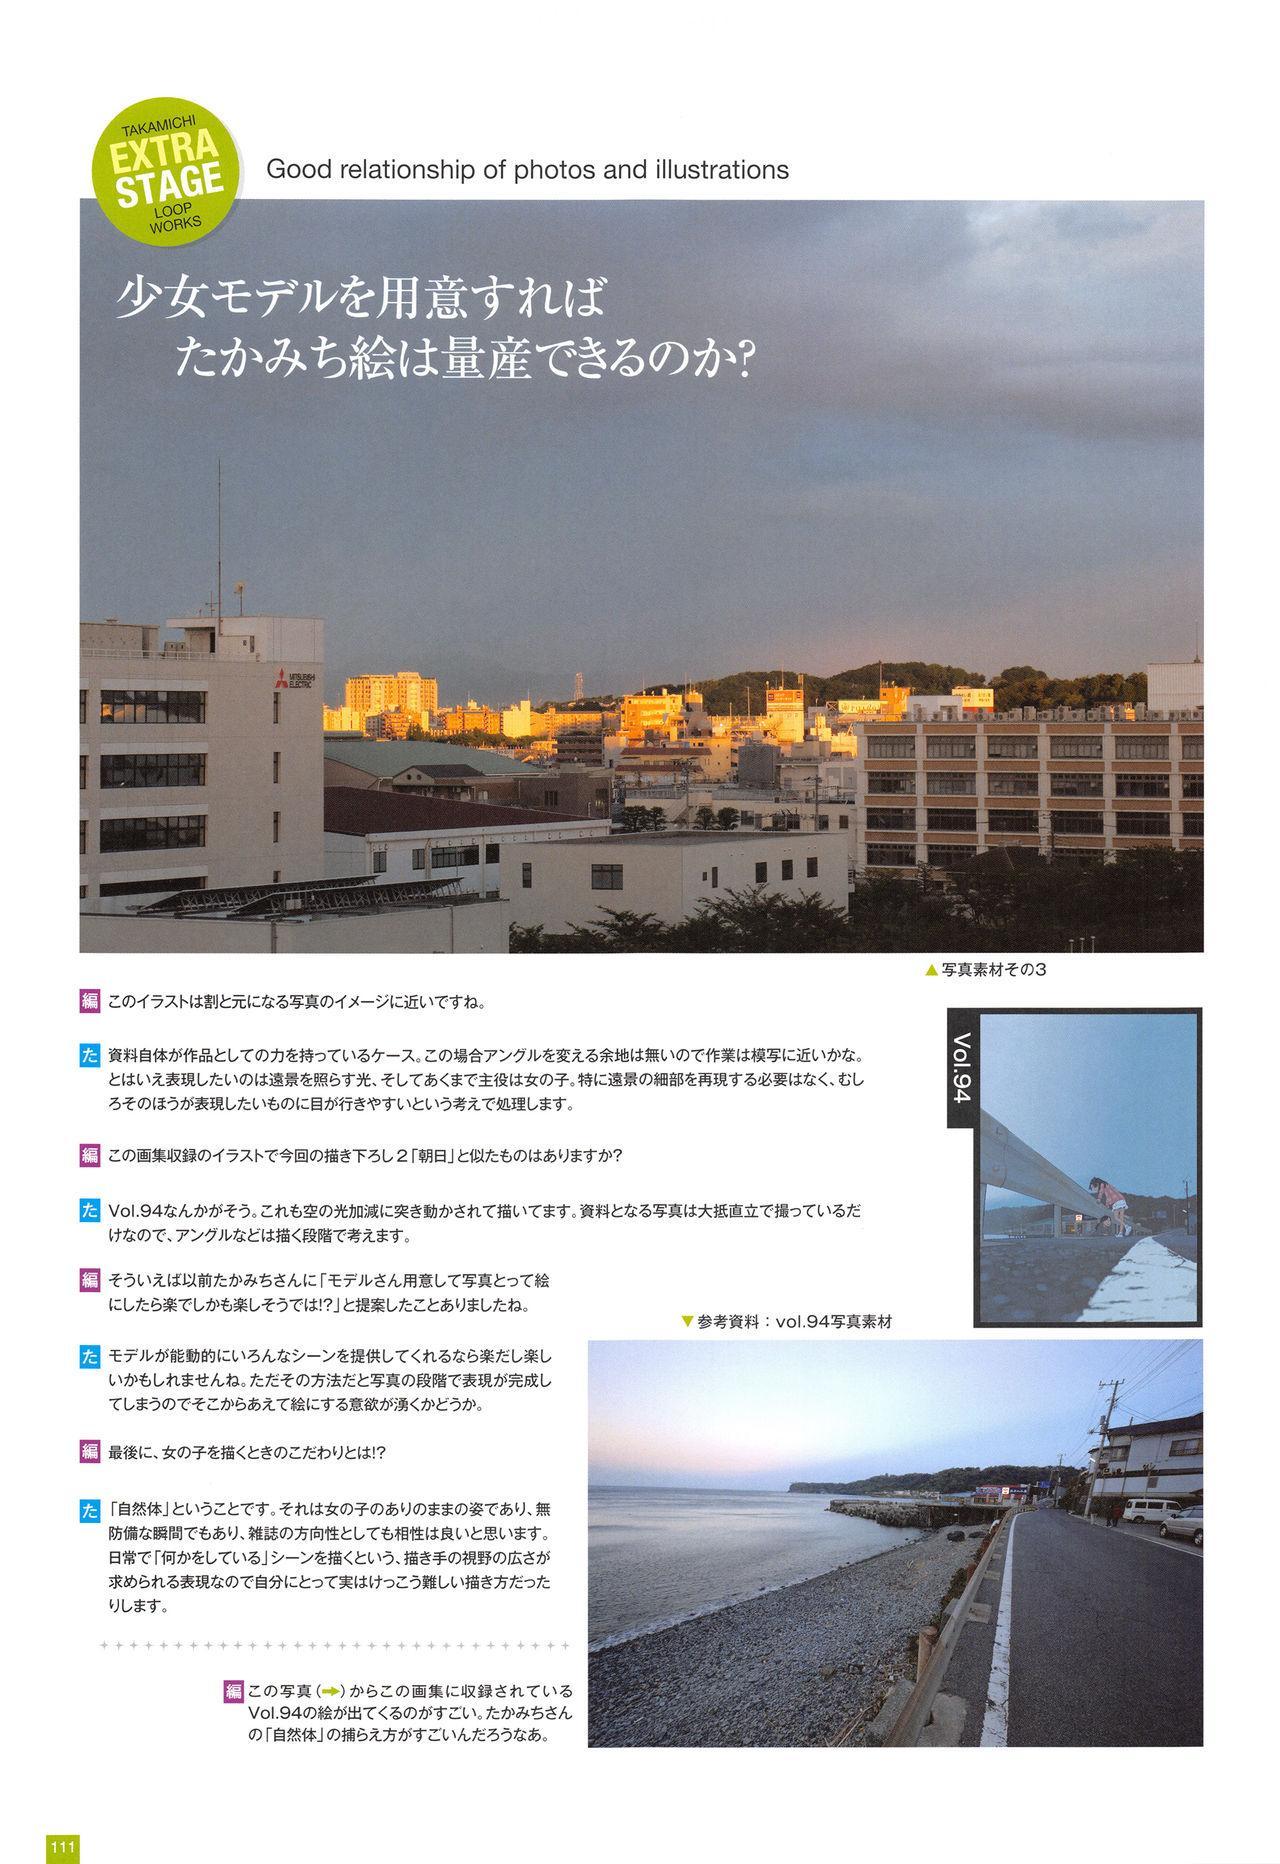 LO Artbook 2-A TAKAMICHI LOOP WORKS 113